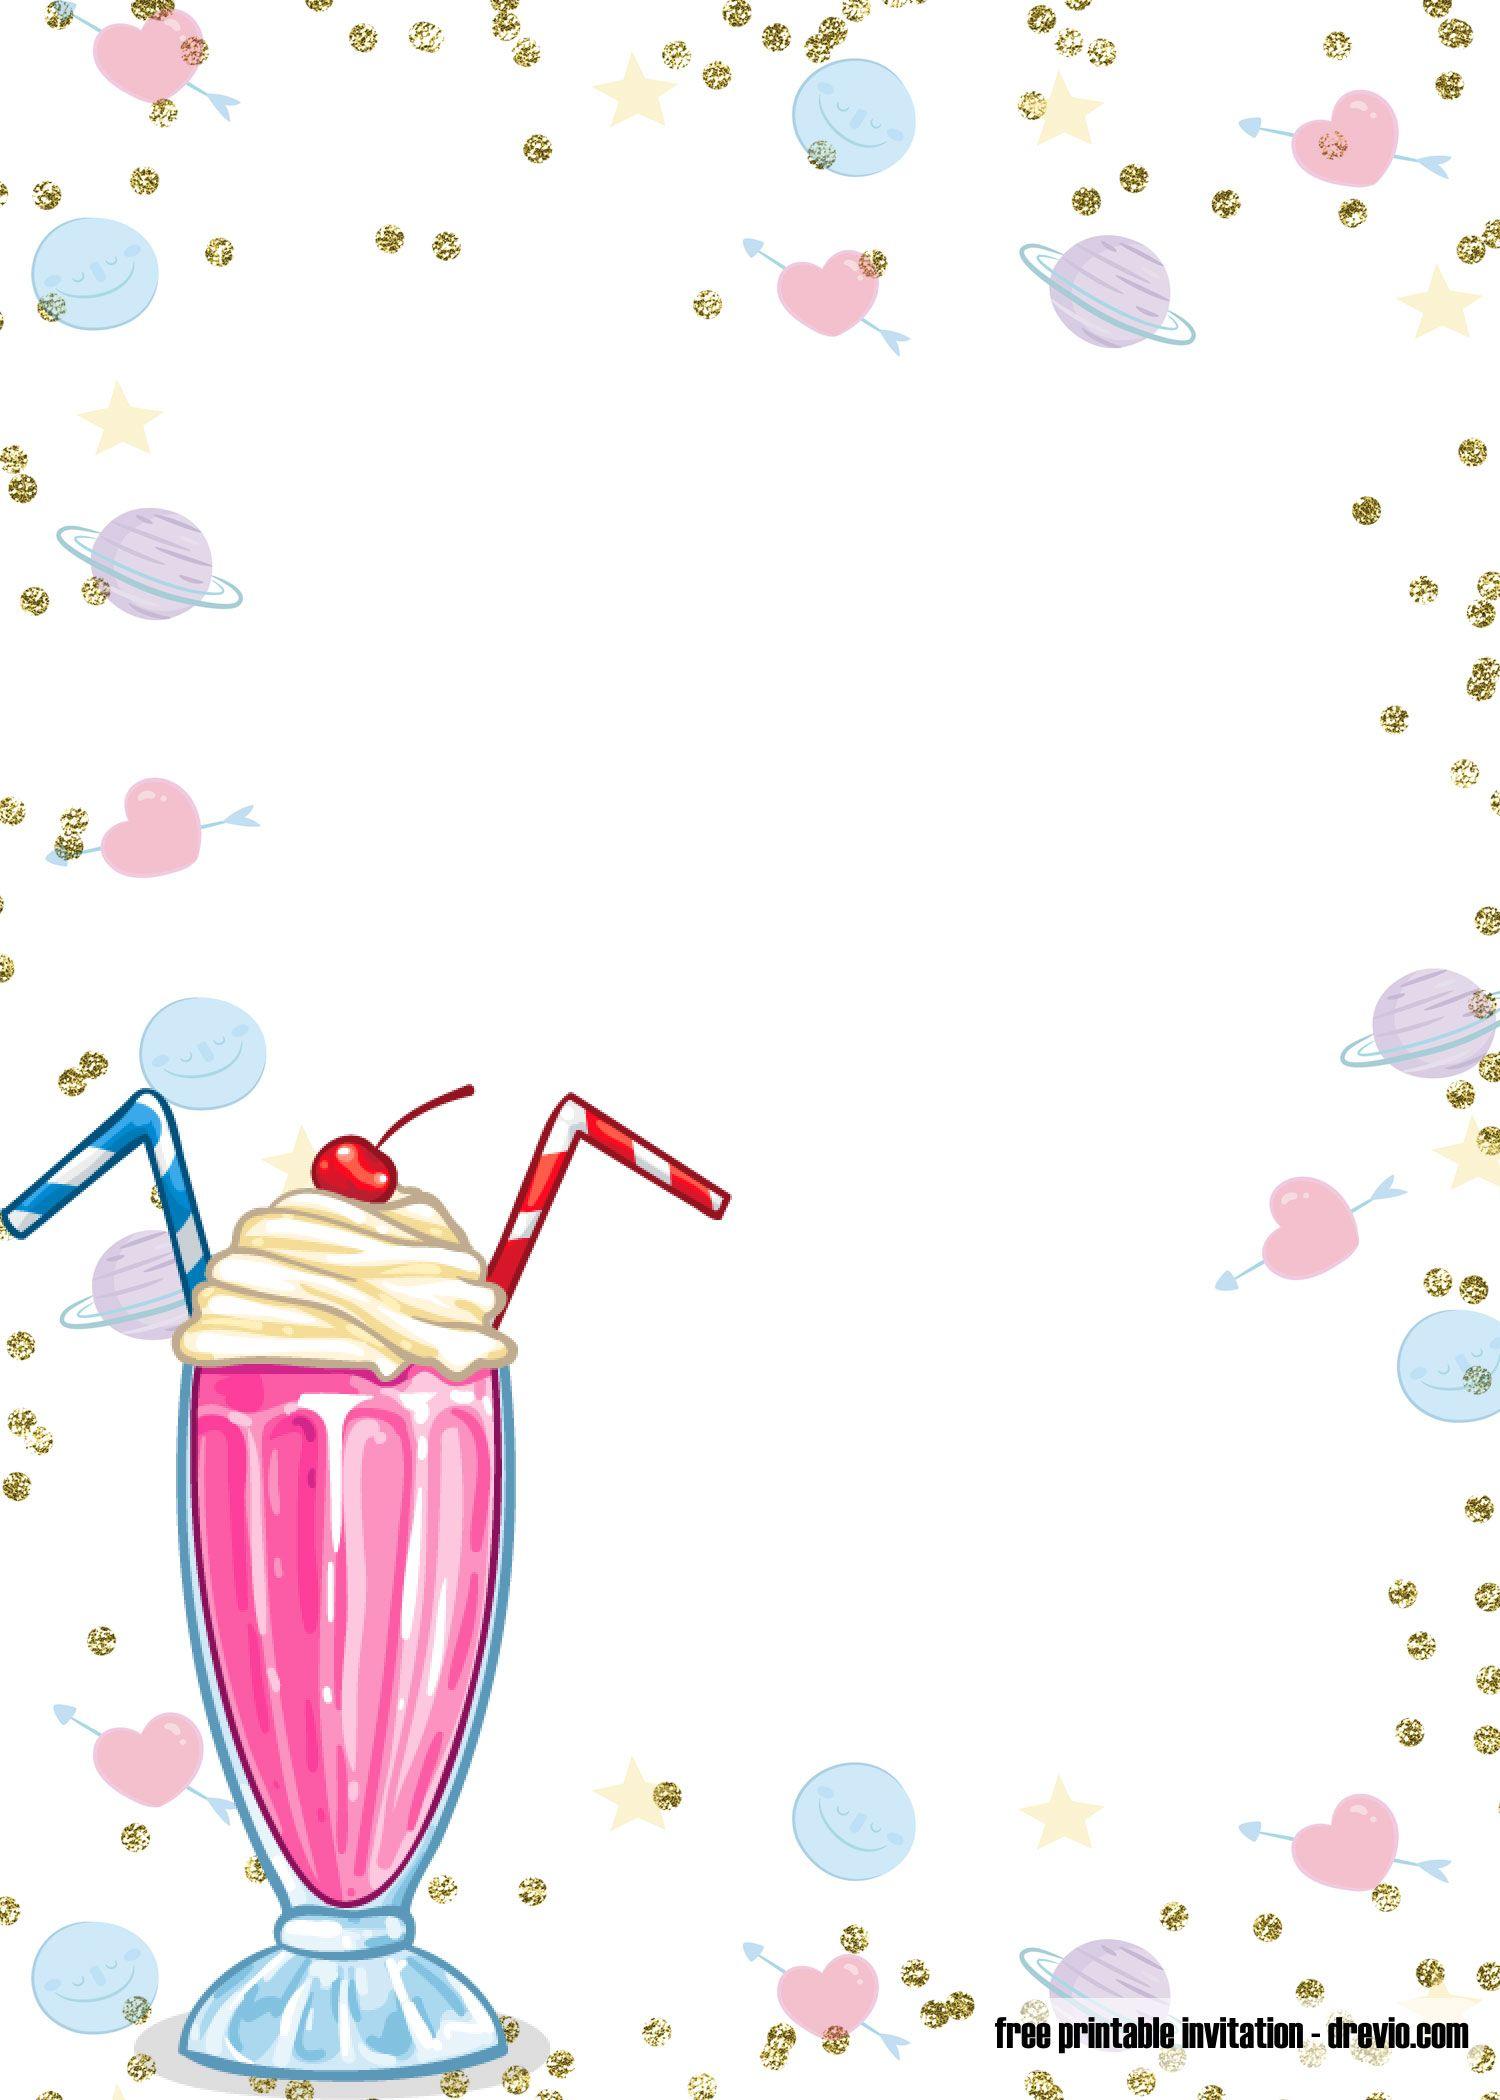 Free Printable Ice Cream Birthday Invitation Templates Ice Cream Invitation Ice Cream Party Invitations Printable Unicorn Birthday Invitations